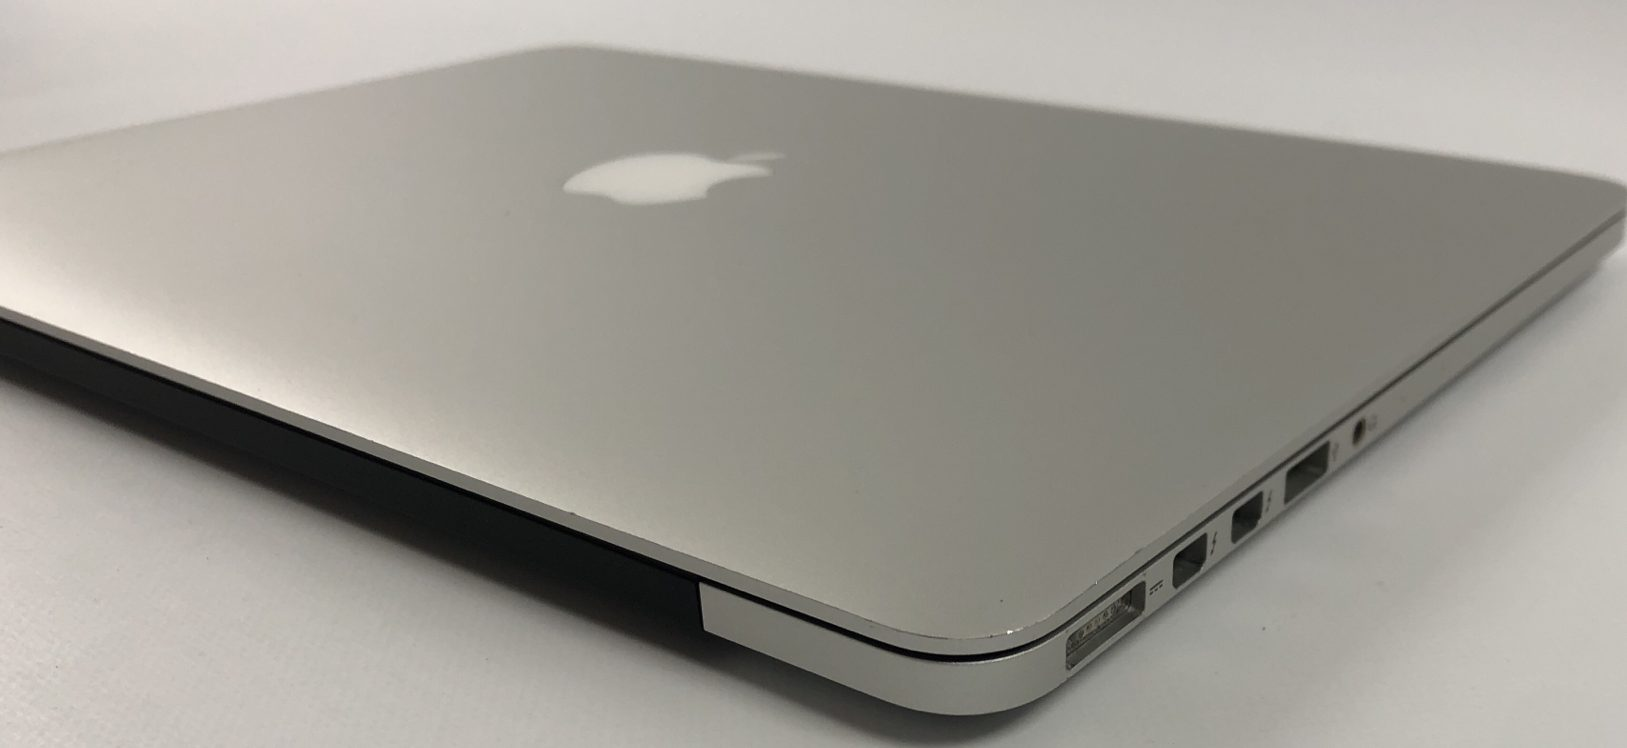 "MacBook Pro Retina 13"" Early 2015 (Intel Core i5 2.7 GHz 8 GB RAM 256 GB SSD), Intel Core i5 2.7 GHz, 8 GB RAM, 256 GB SSD, Kuva 3"